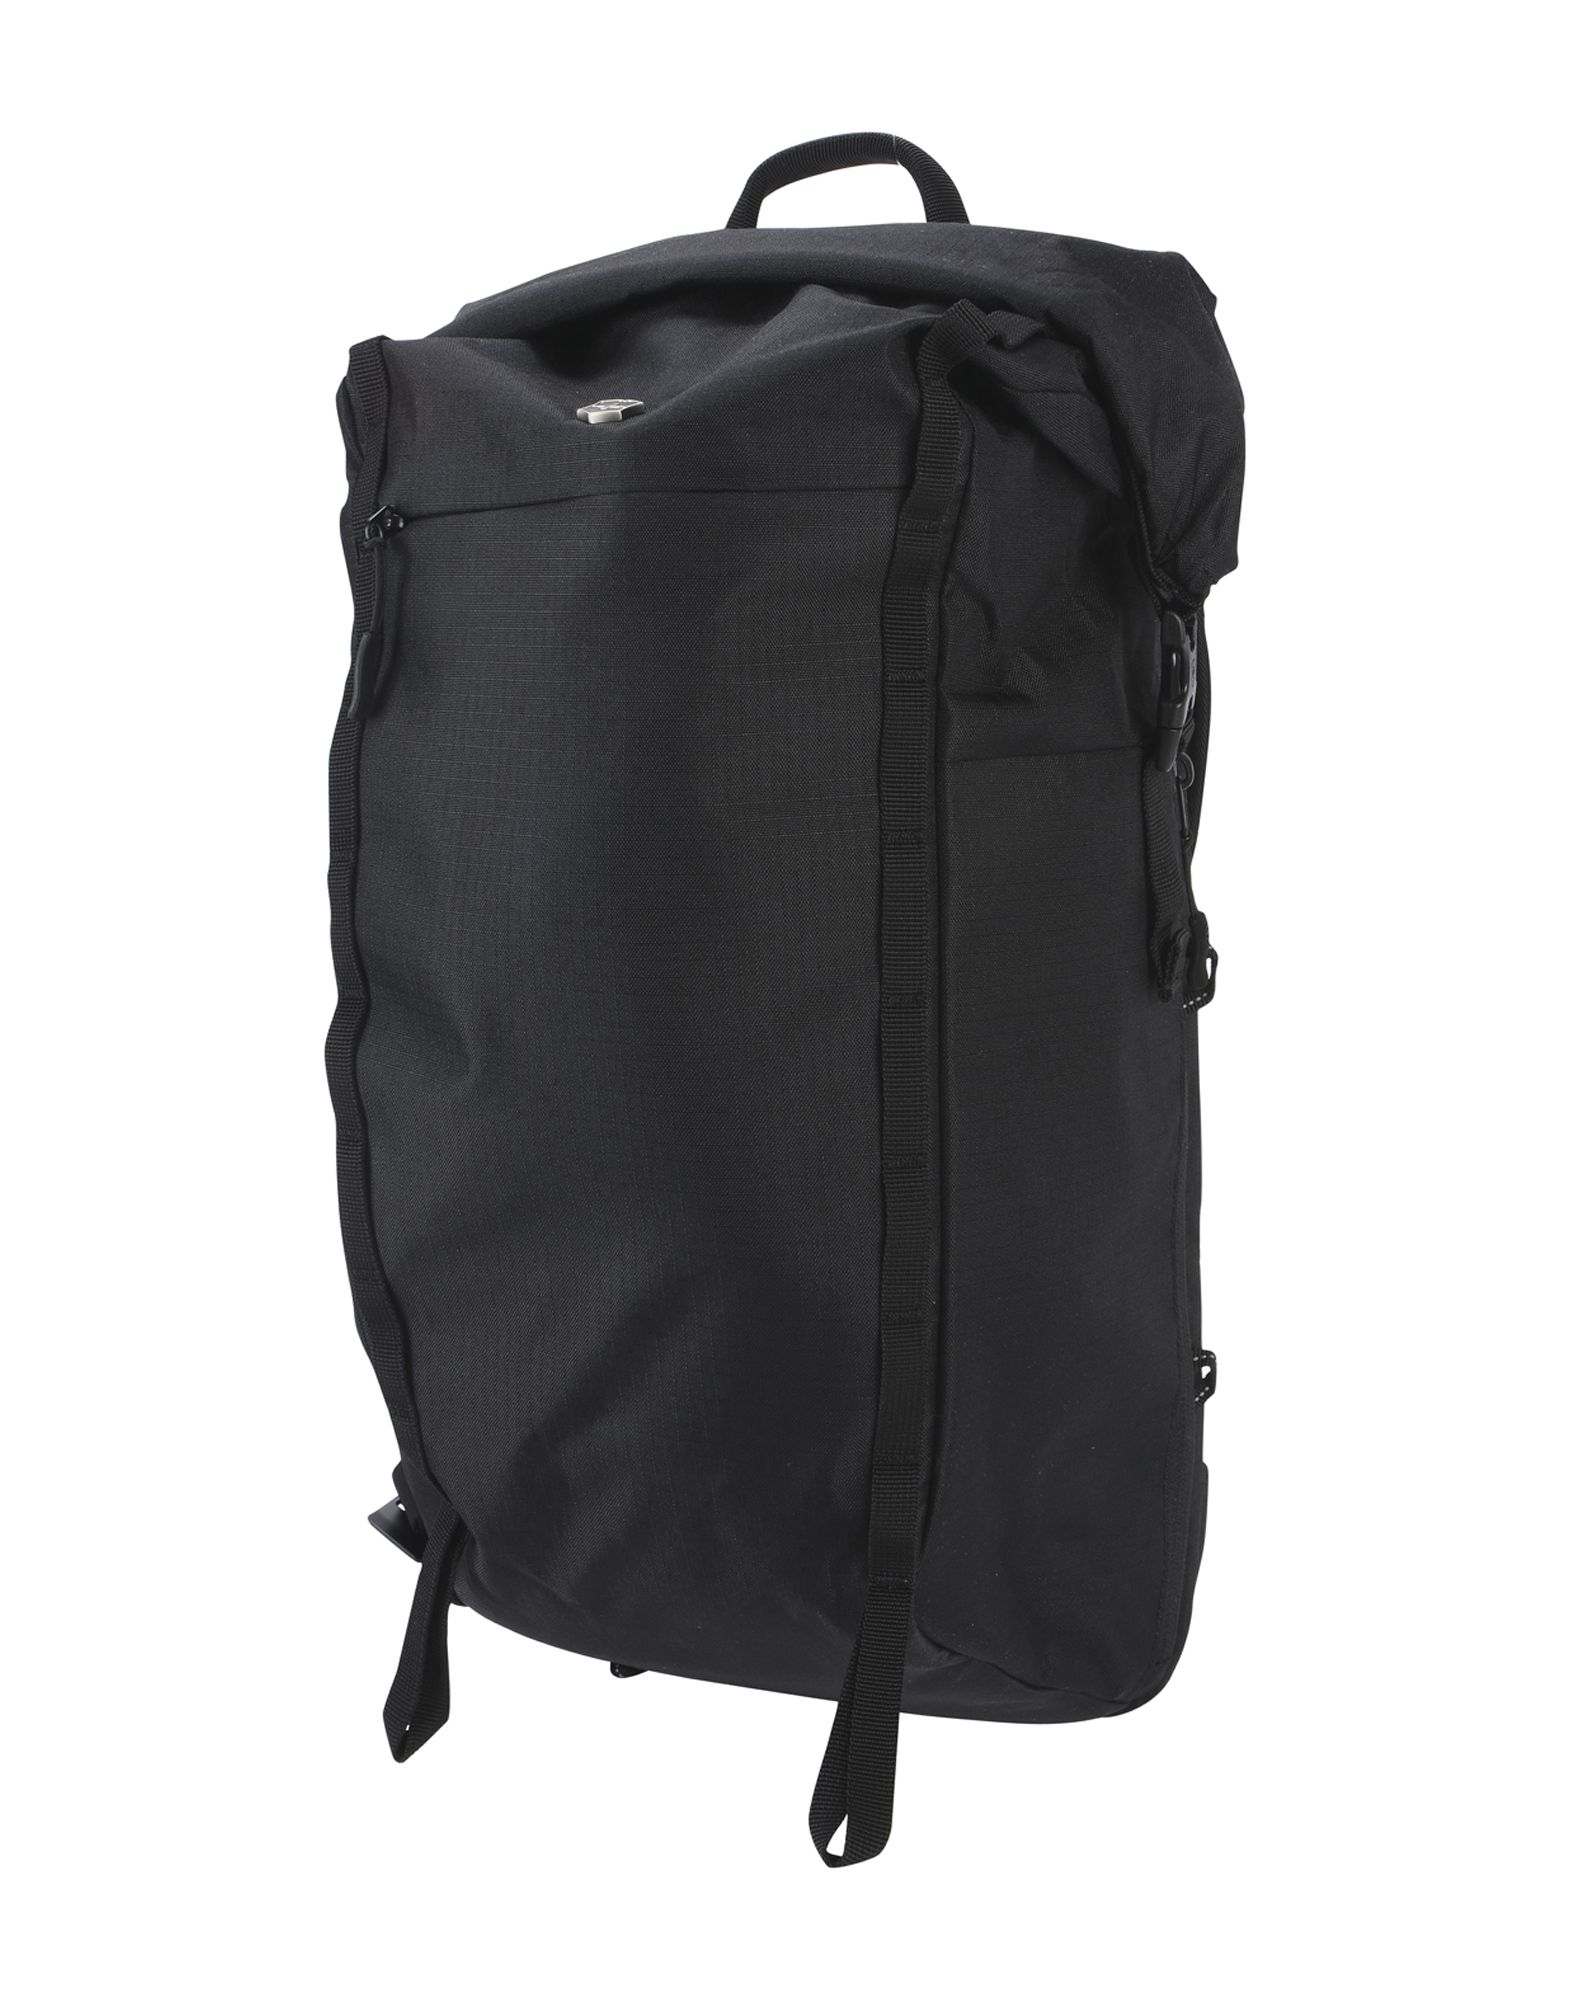 Zaini & Marsupi Victorinox Altmont Active Rolltop Laptop Backpack - Uomo - Acquista online su